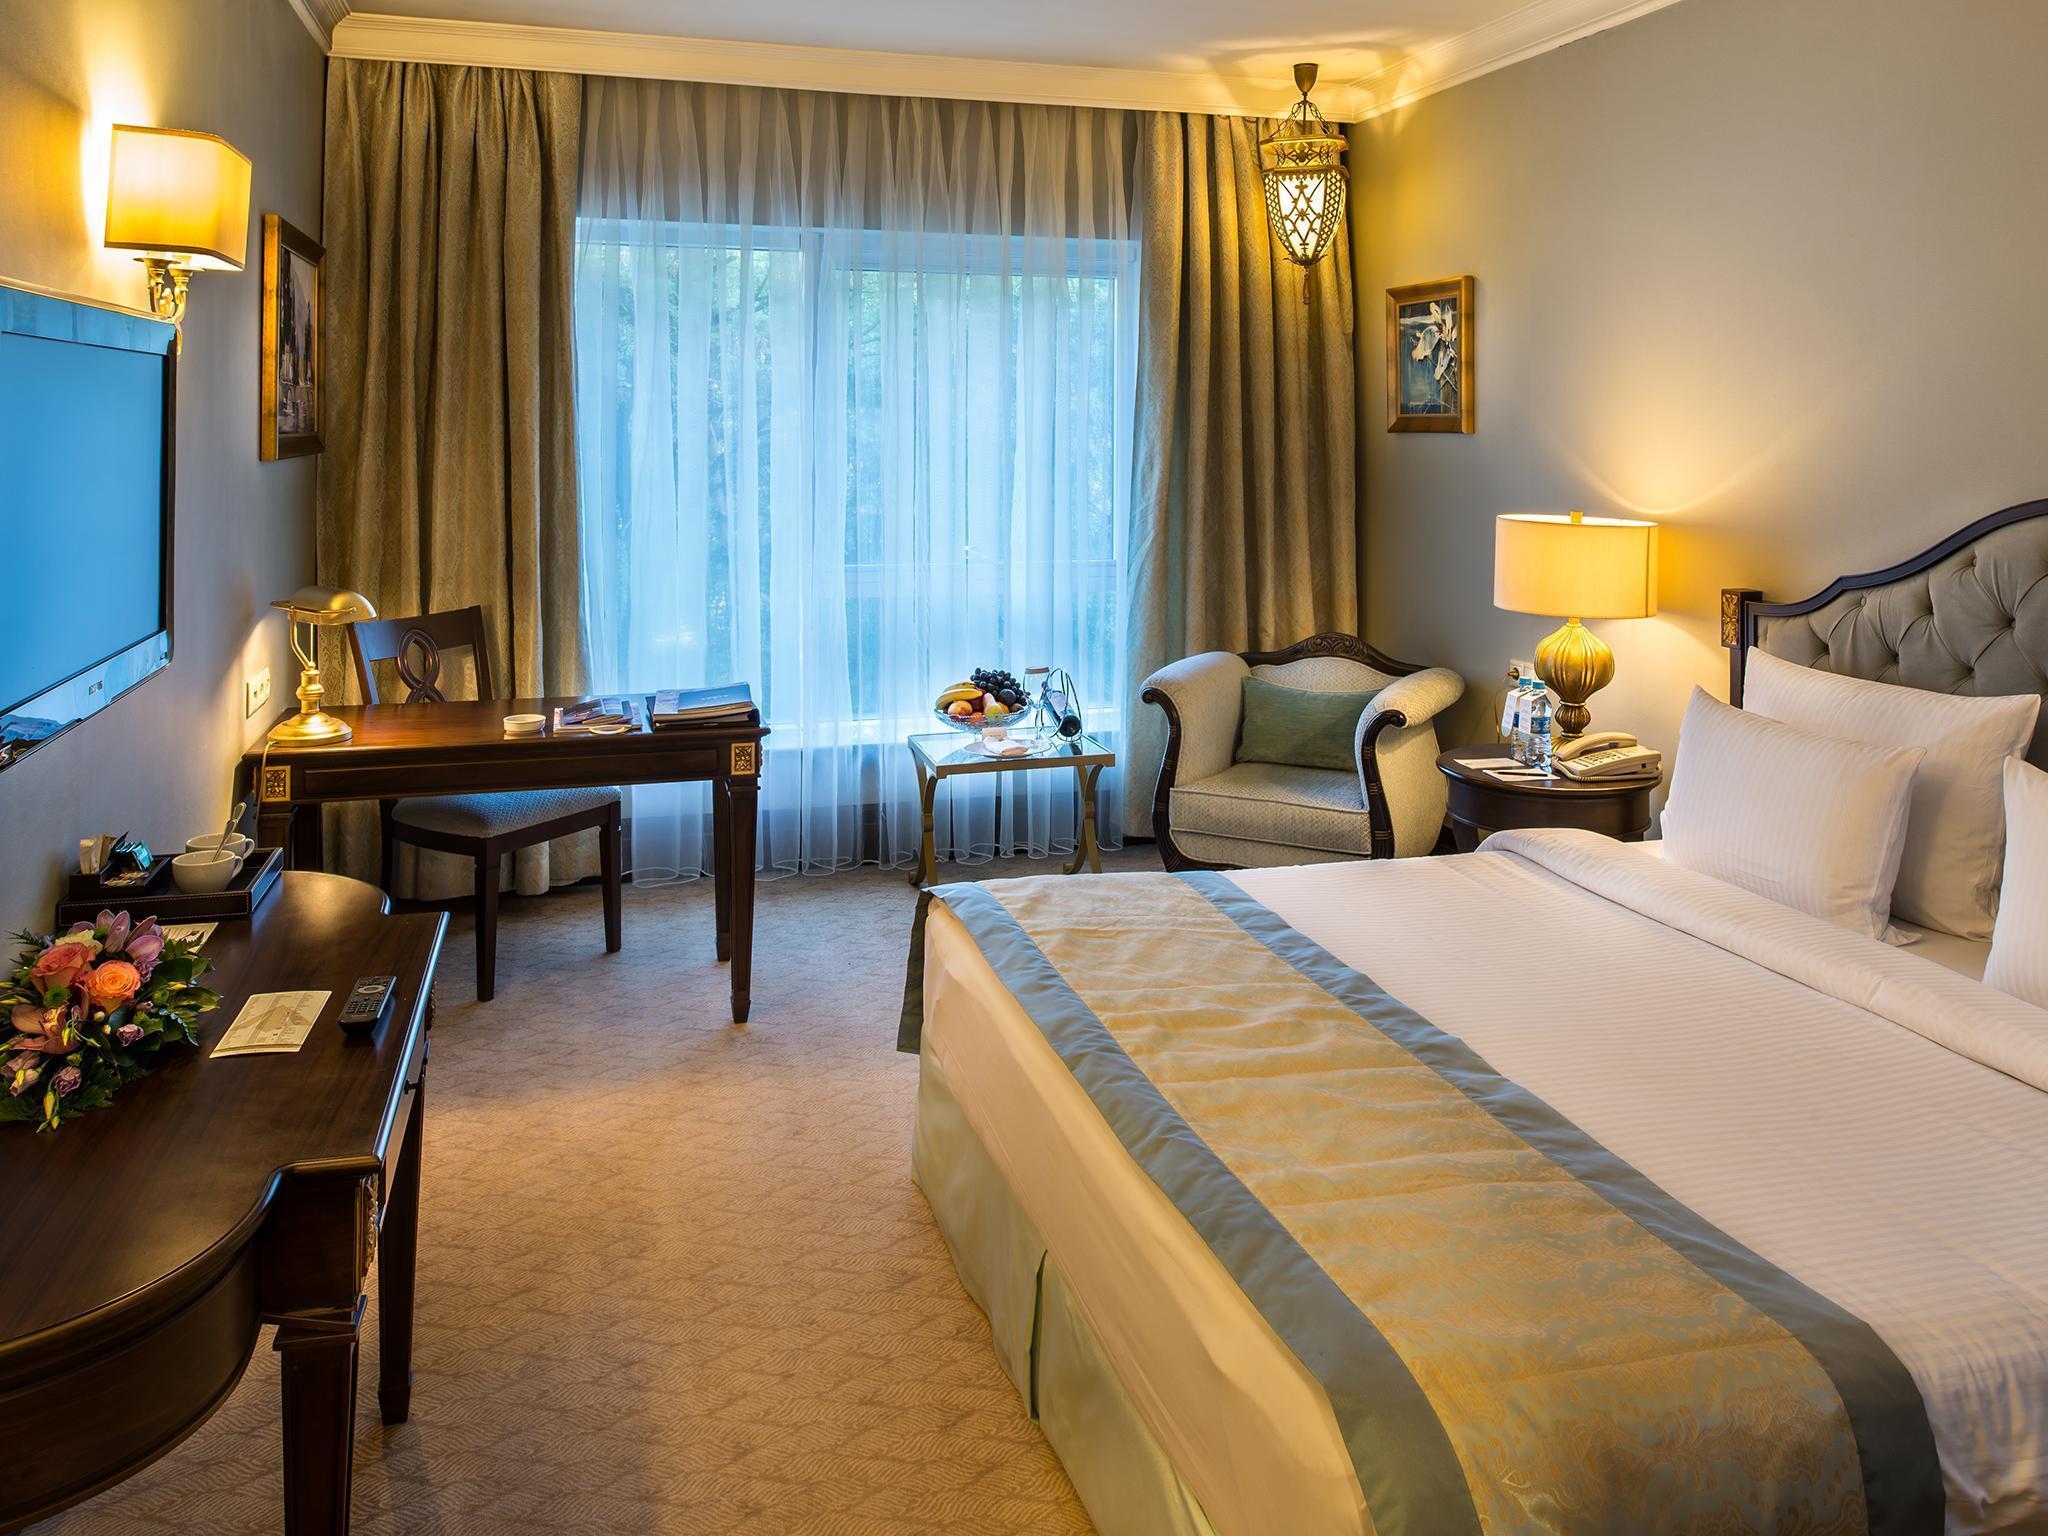 Rixos Almaty Hotel, Almaty (Alma-Ata)